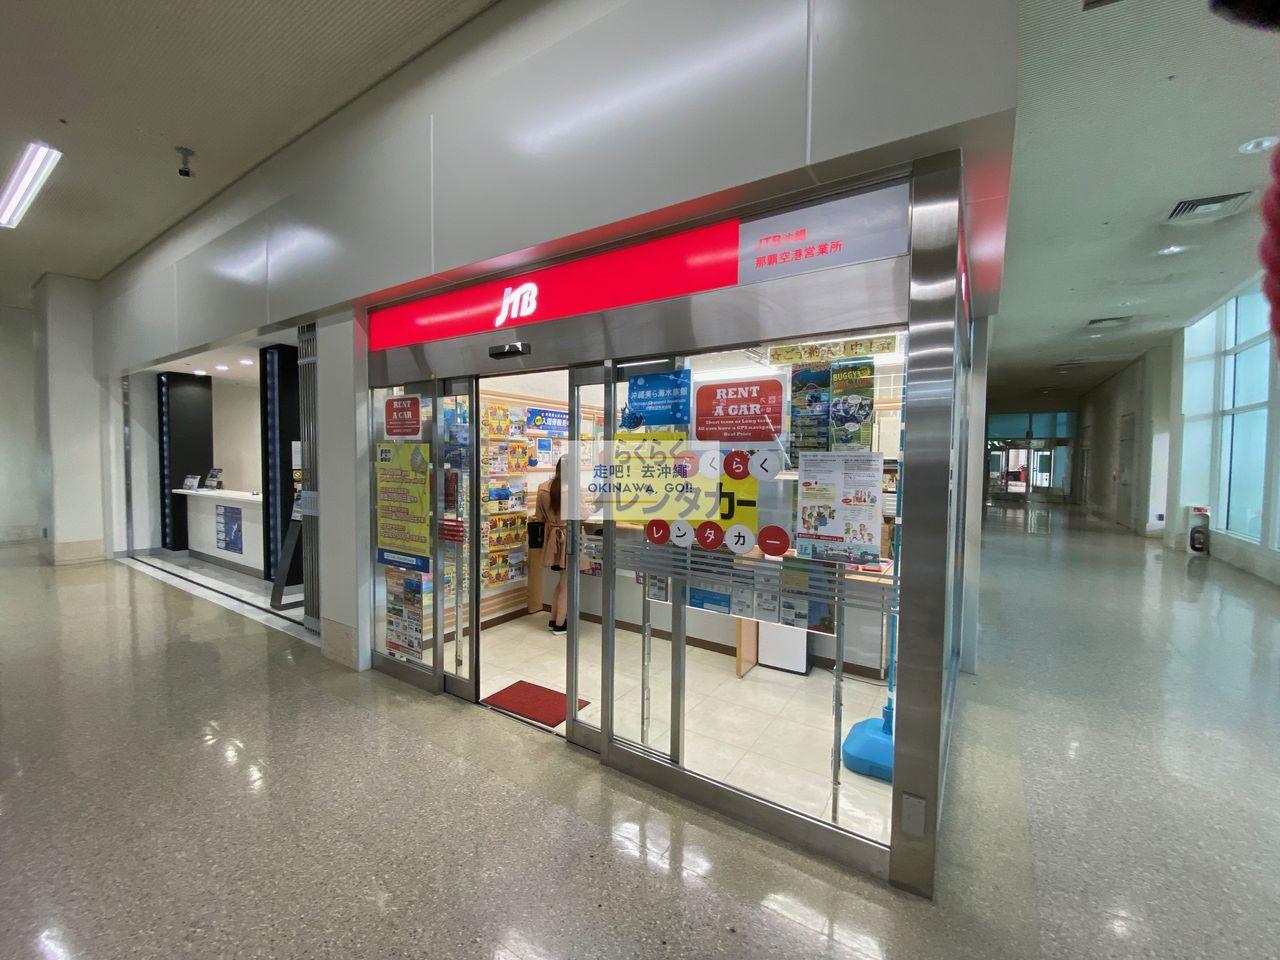 JTB那霸機場營業處-Okinawa Enjoy Pass